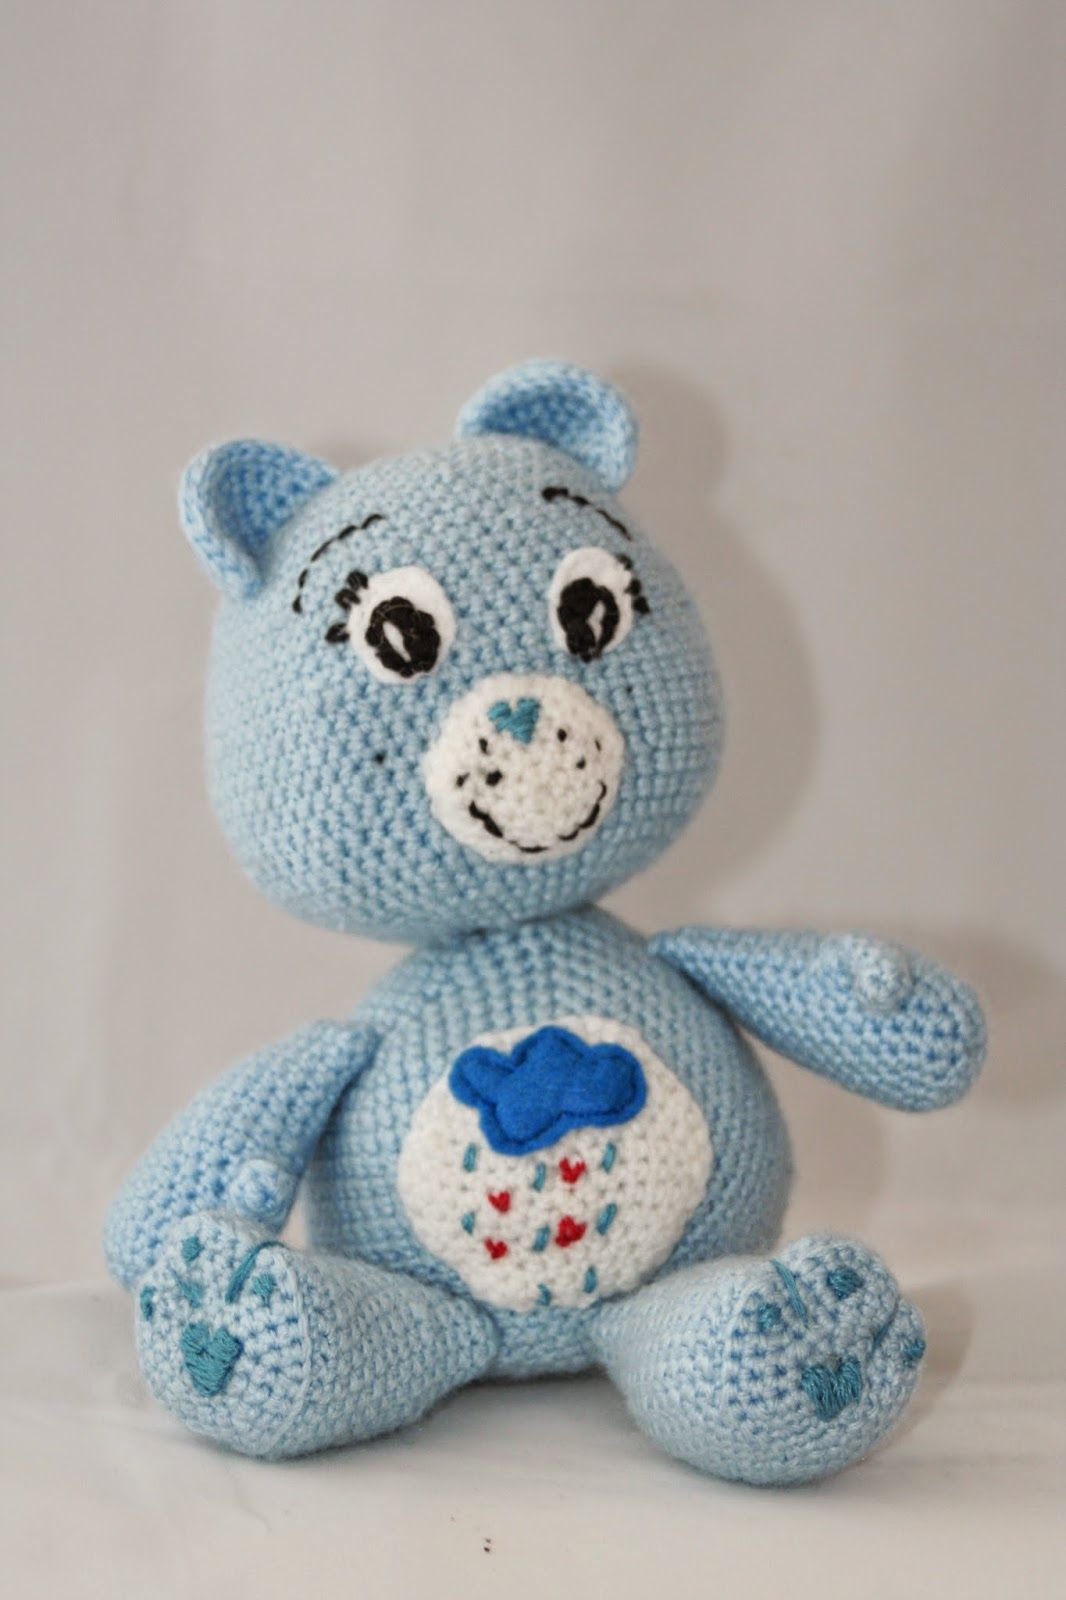 craftomama: Troskliwe misie | Toys | Pinterest